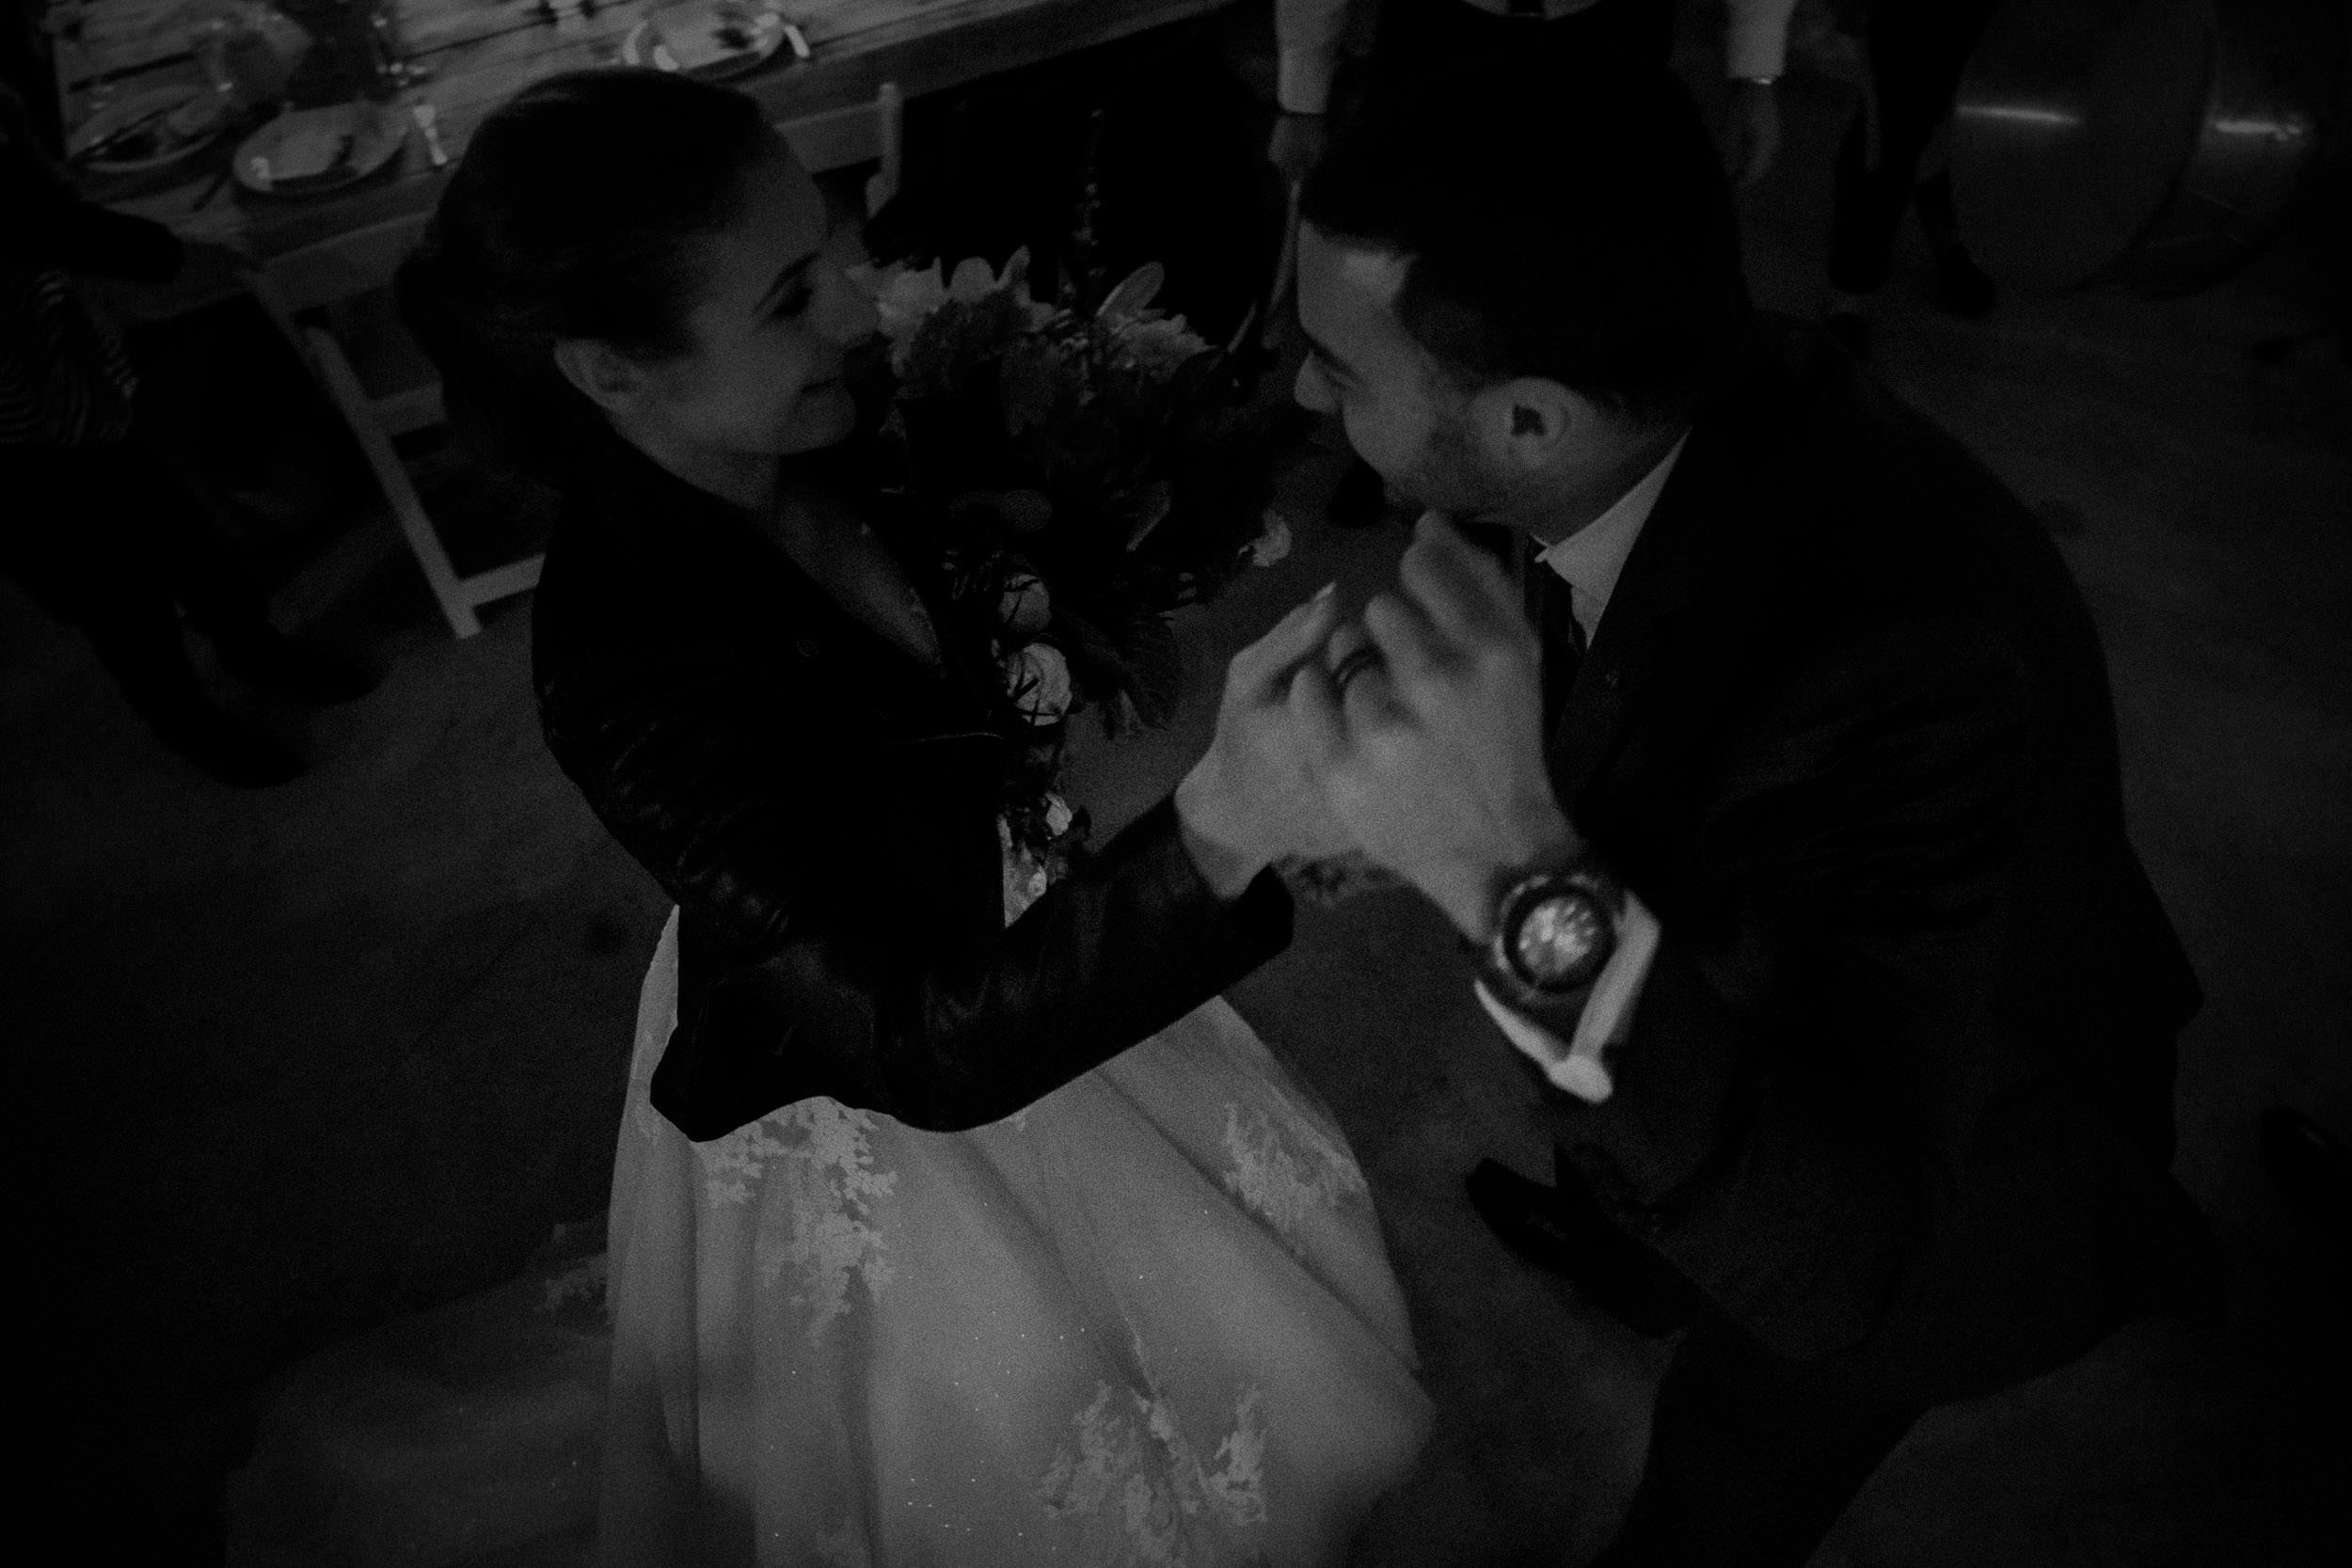 g_c wedding - kings _ thieves elopement wedding photography - blog 107.jpg